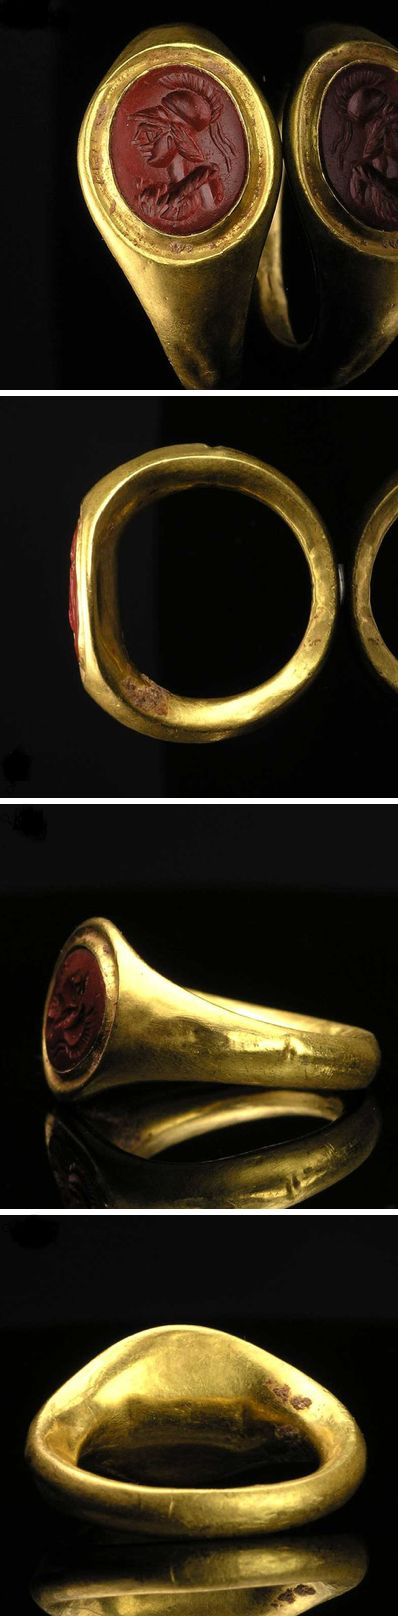 A fine Roman Signet Ring with Athena intaglio, ca 1st century AD